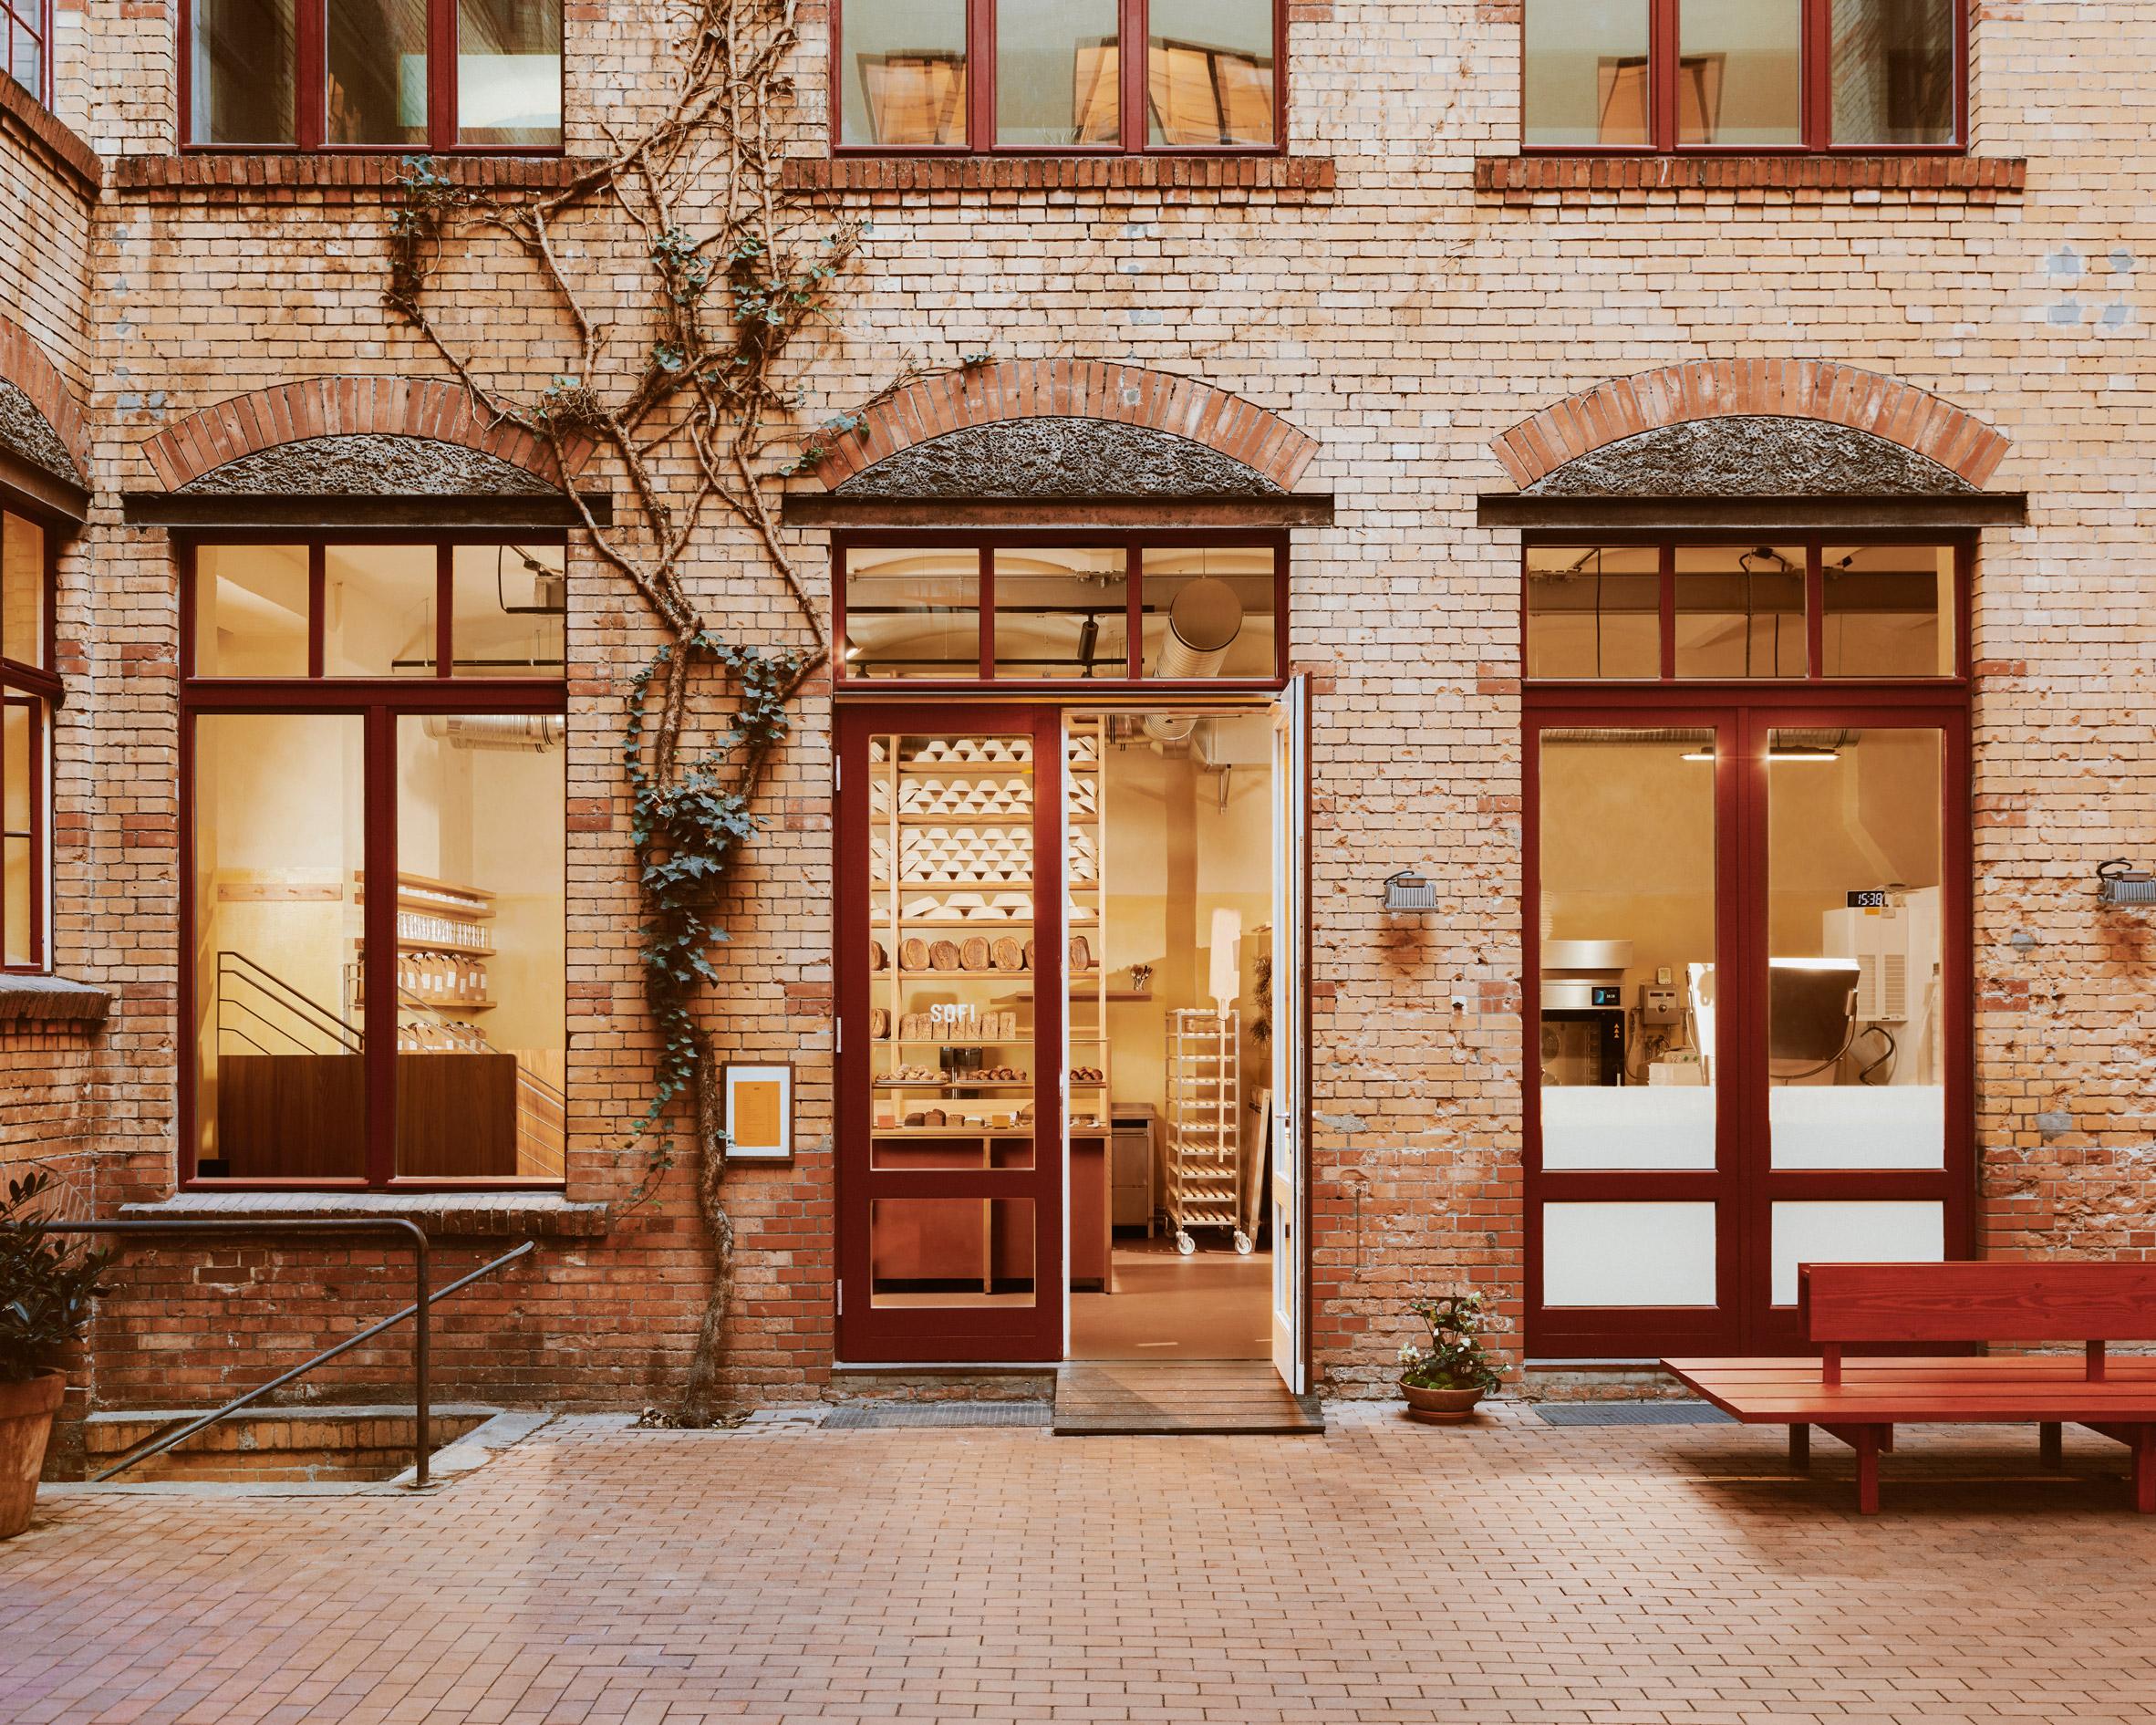 Exterior of Berlin bakery by Mathias Mentze, Alexander Vedel Ottenstein and Dreimeta